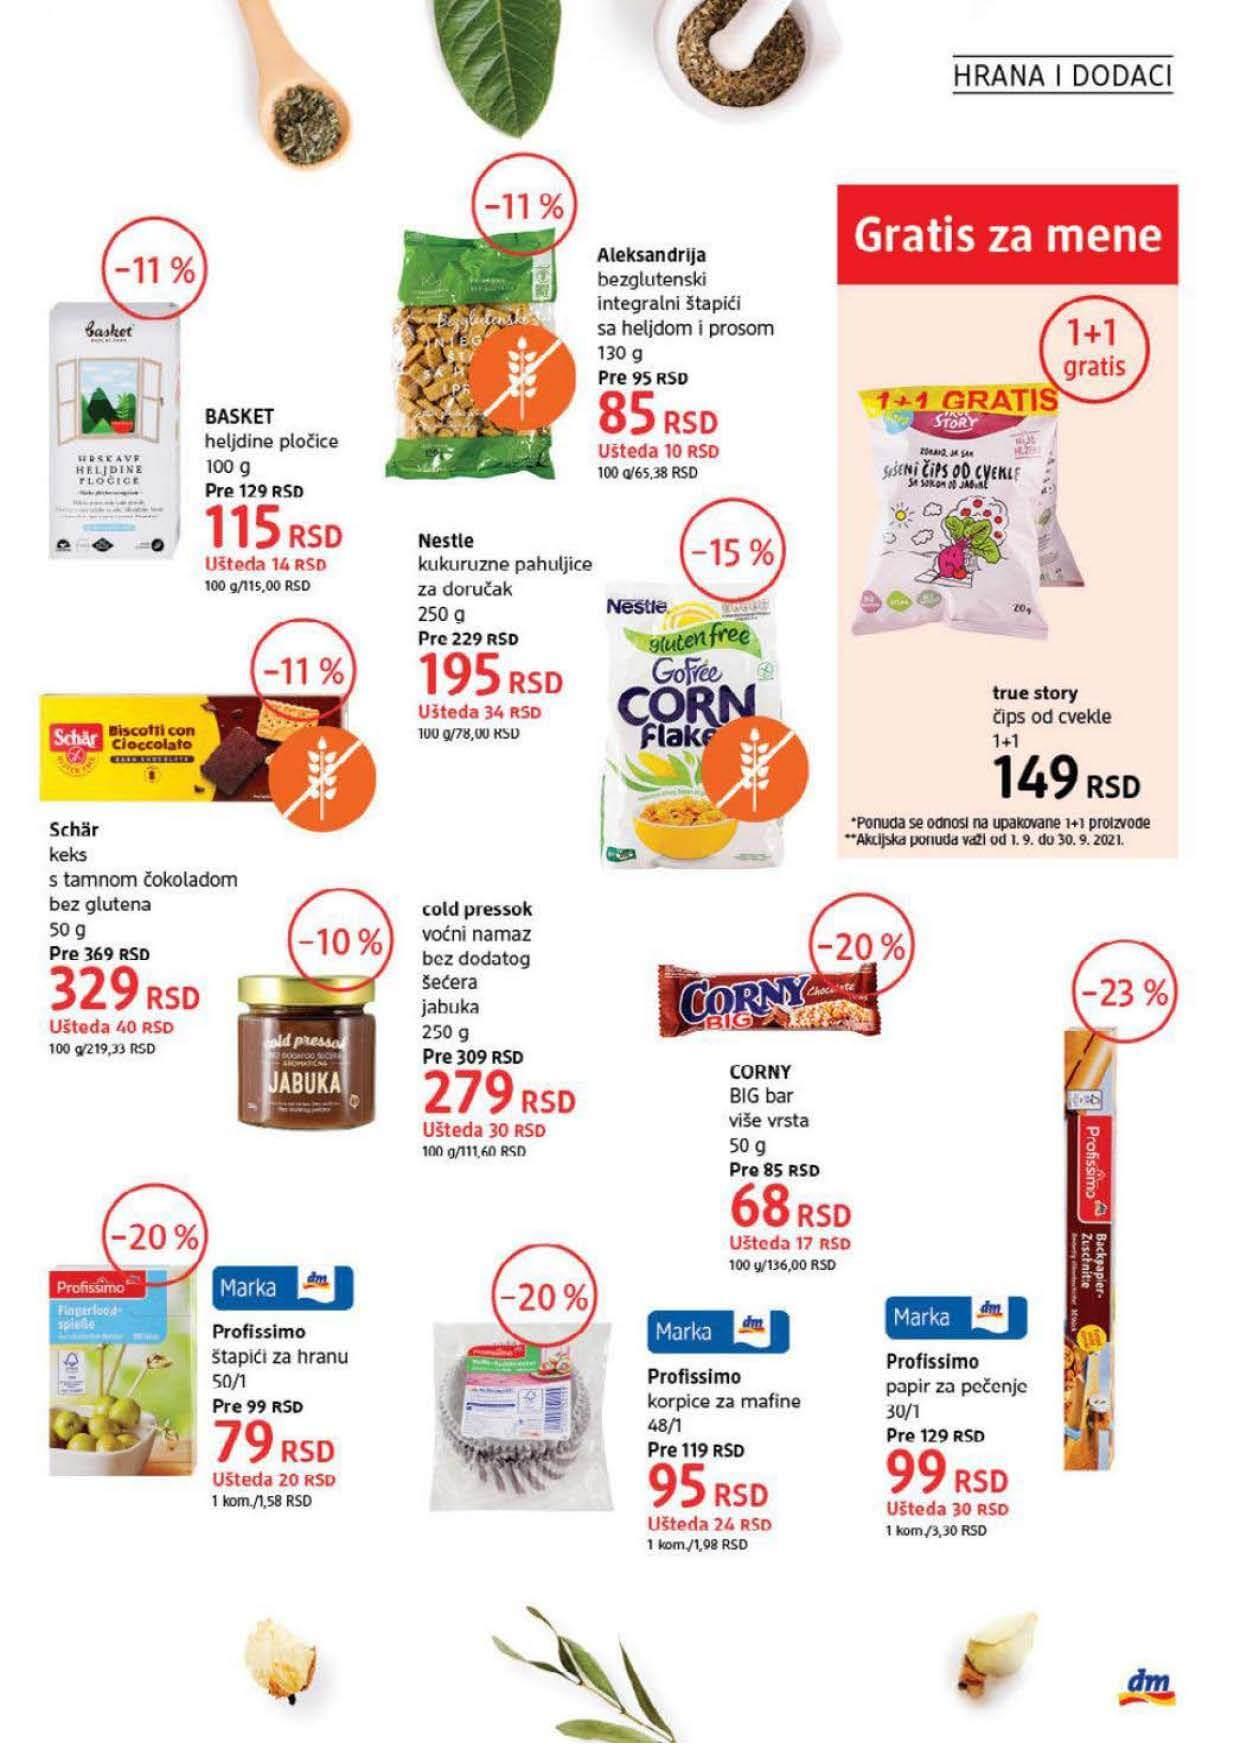 DM Katalog Srbija SEPTEMBAR 2021 1.9.2021. 30.9.2021. Page 35